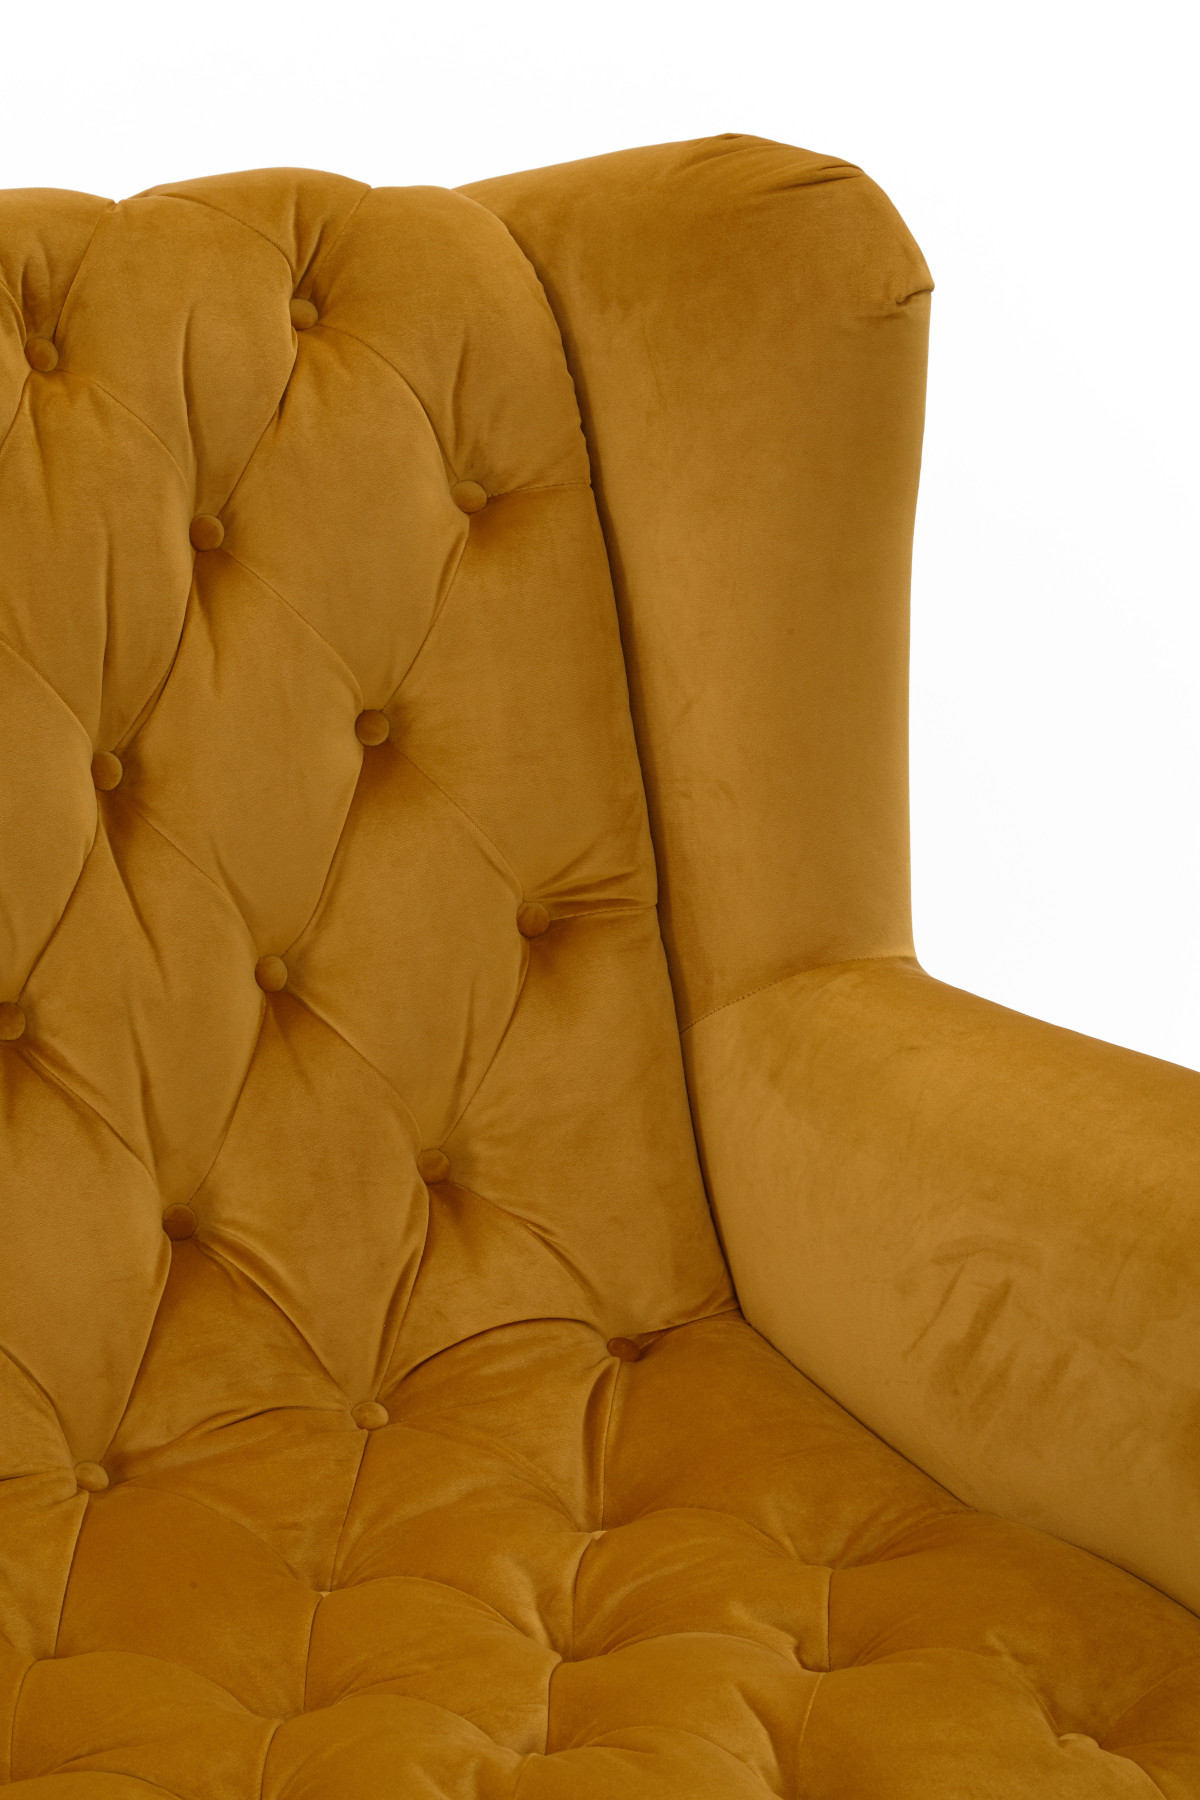 Theo 2 Seater Sofa